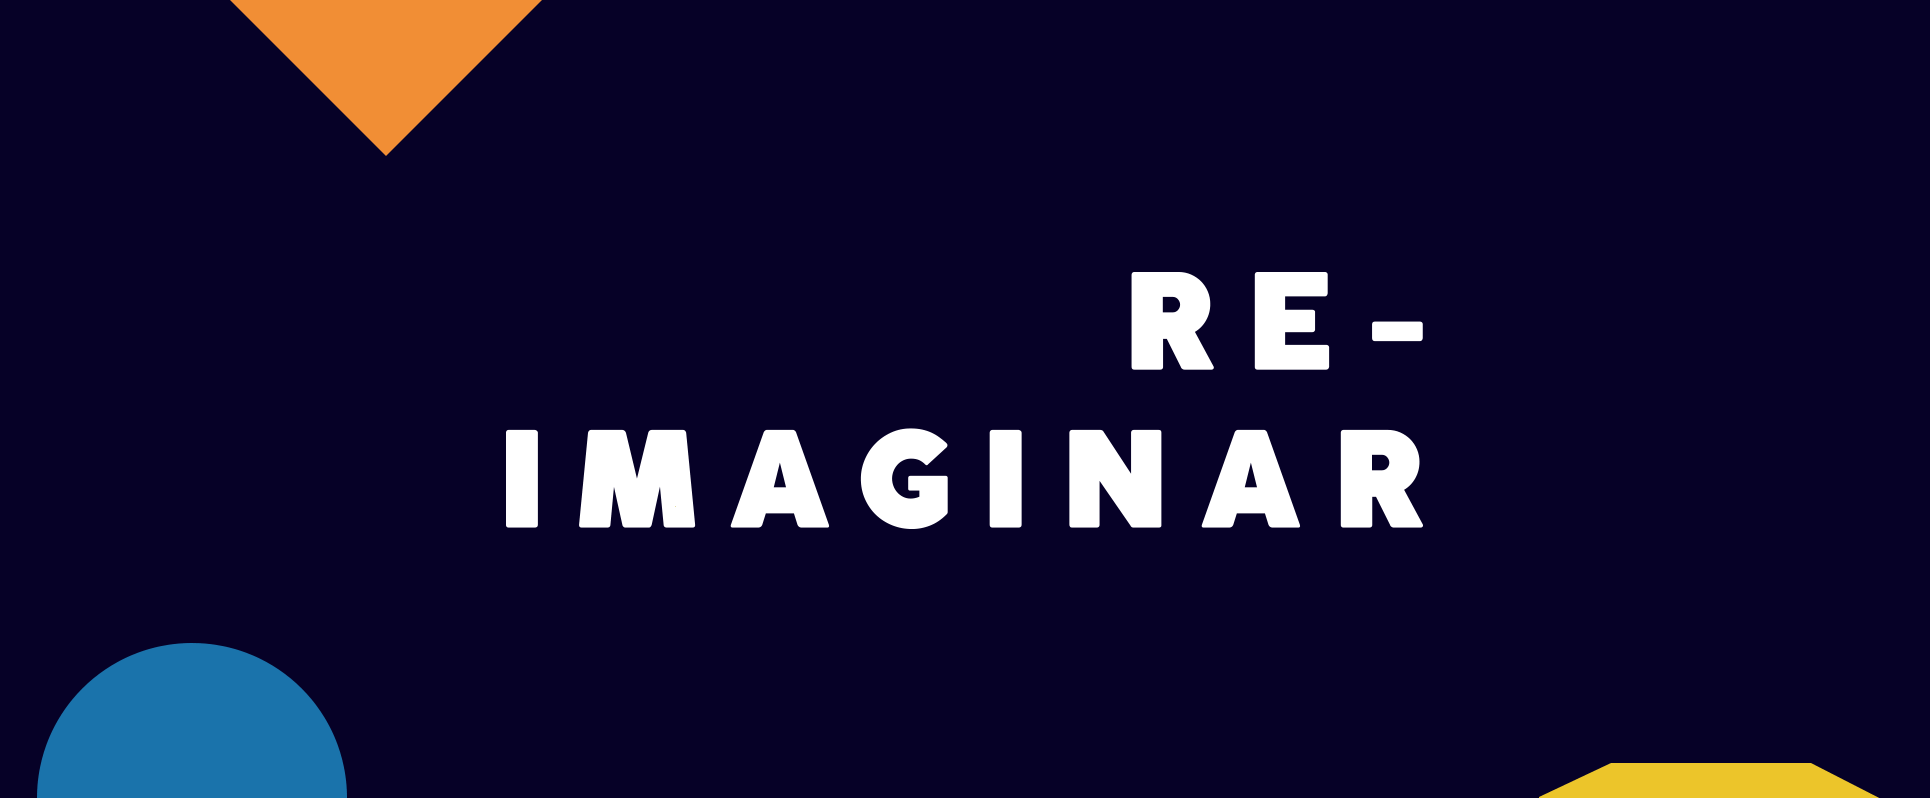 Reimaginar-sliderprincipal